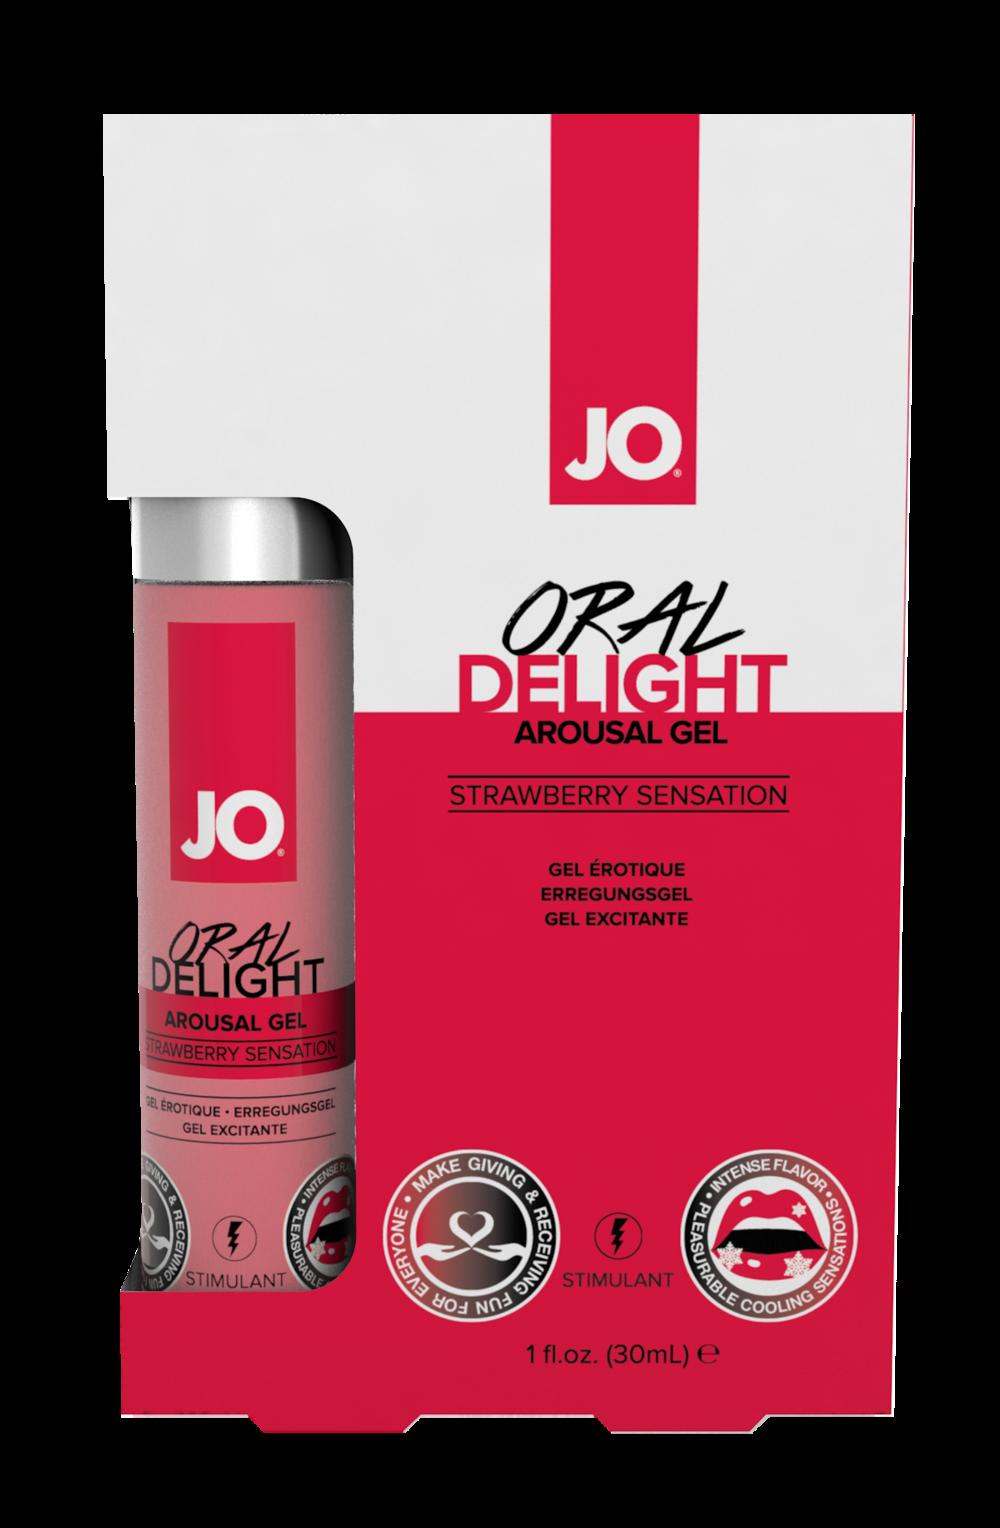 40481 - JO ORAL DELIGHT - STRAWBERRY SENSATION - 1fl.oz 30mL  (MOQ 12 units - Includes Counter Display C.png